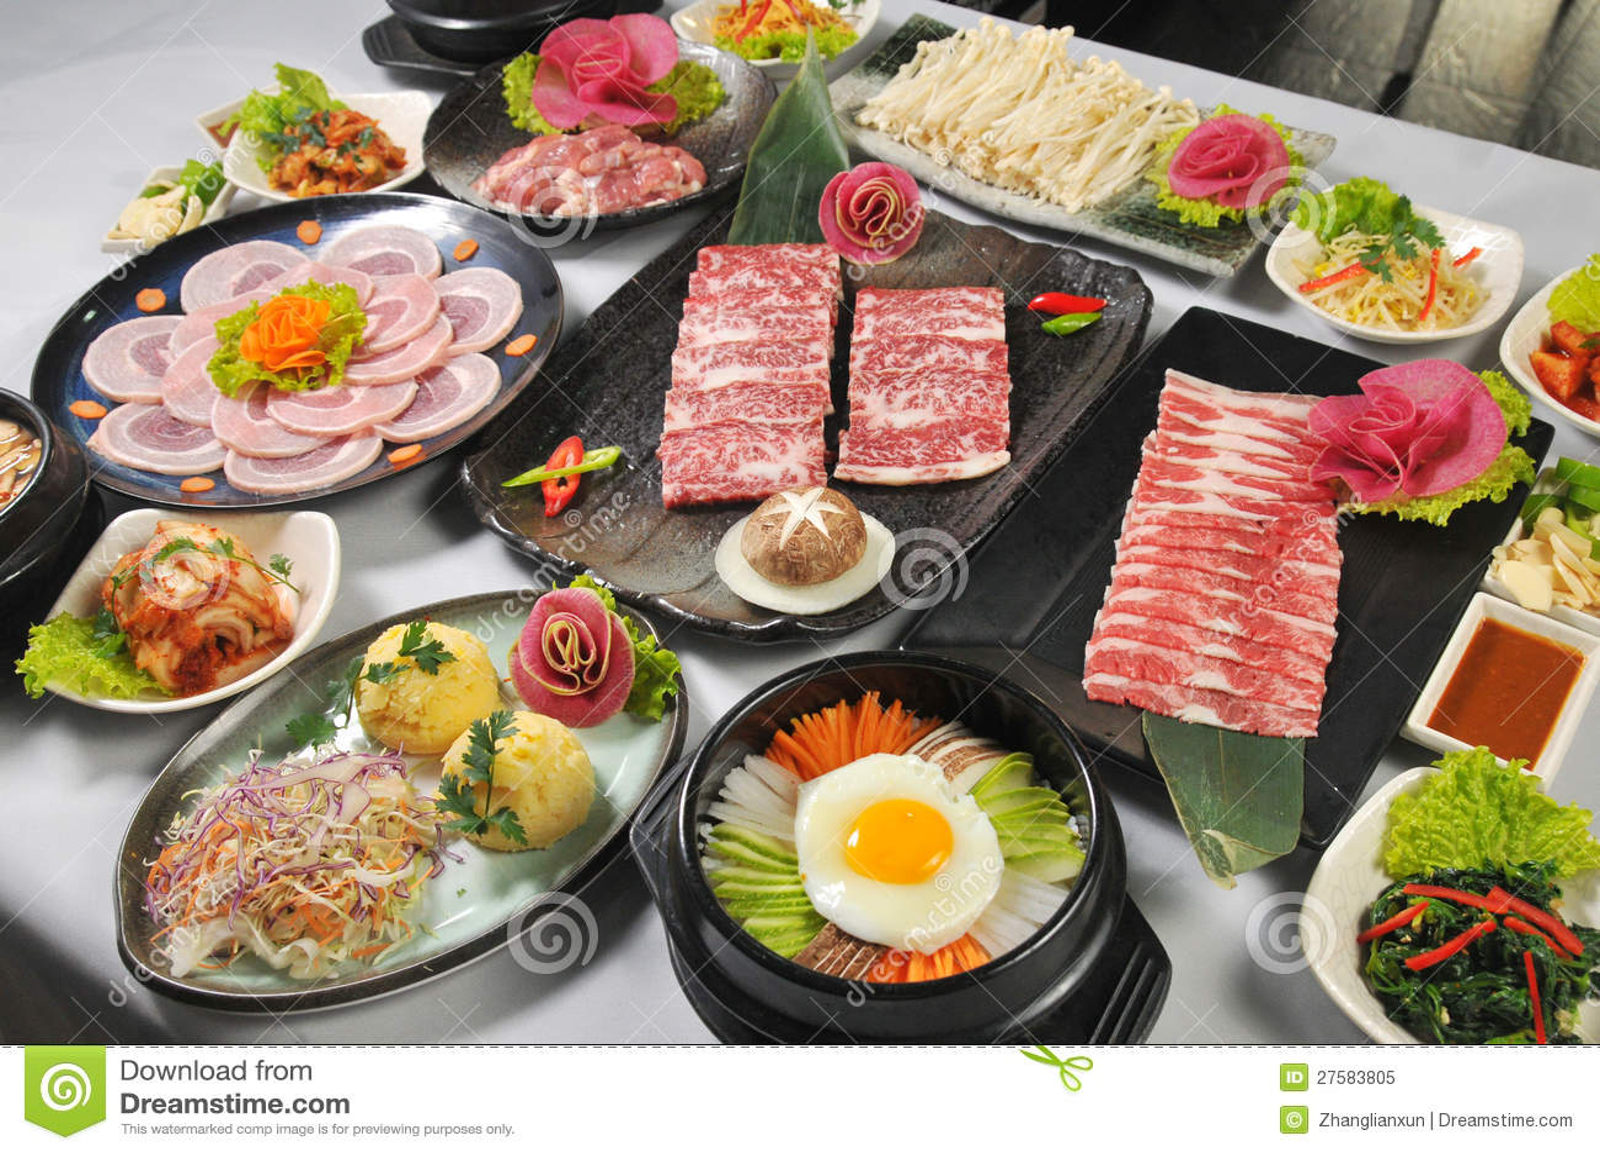 koreanische küche lizenzfreies stockfoto - bild: 27583805